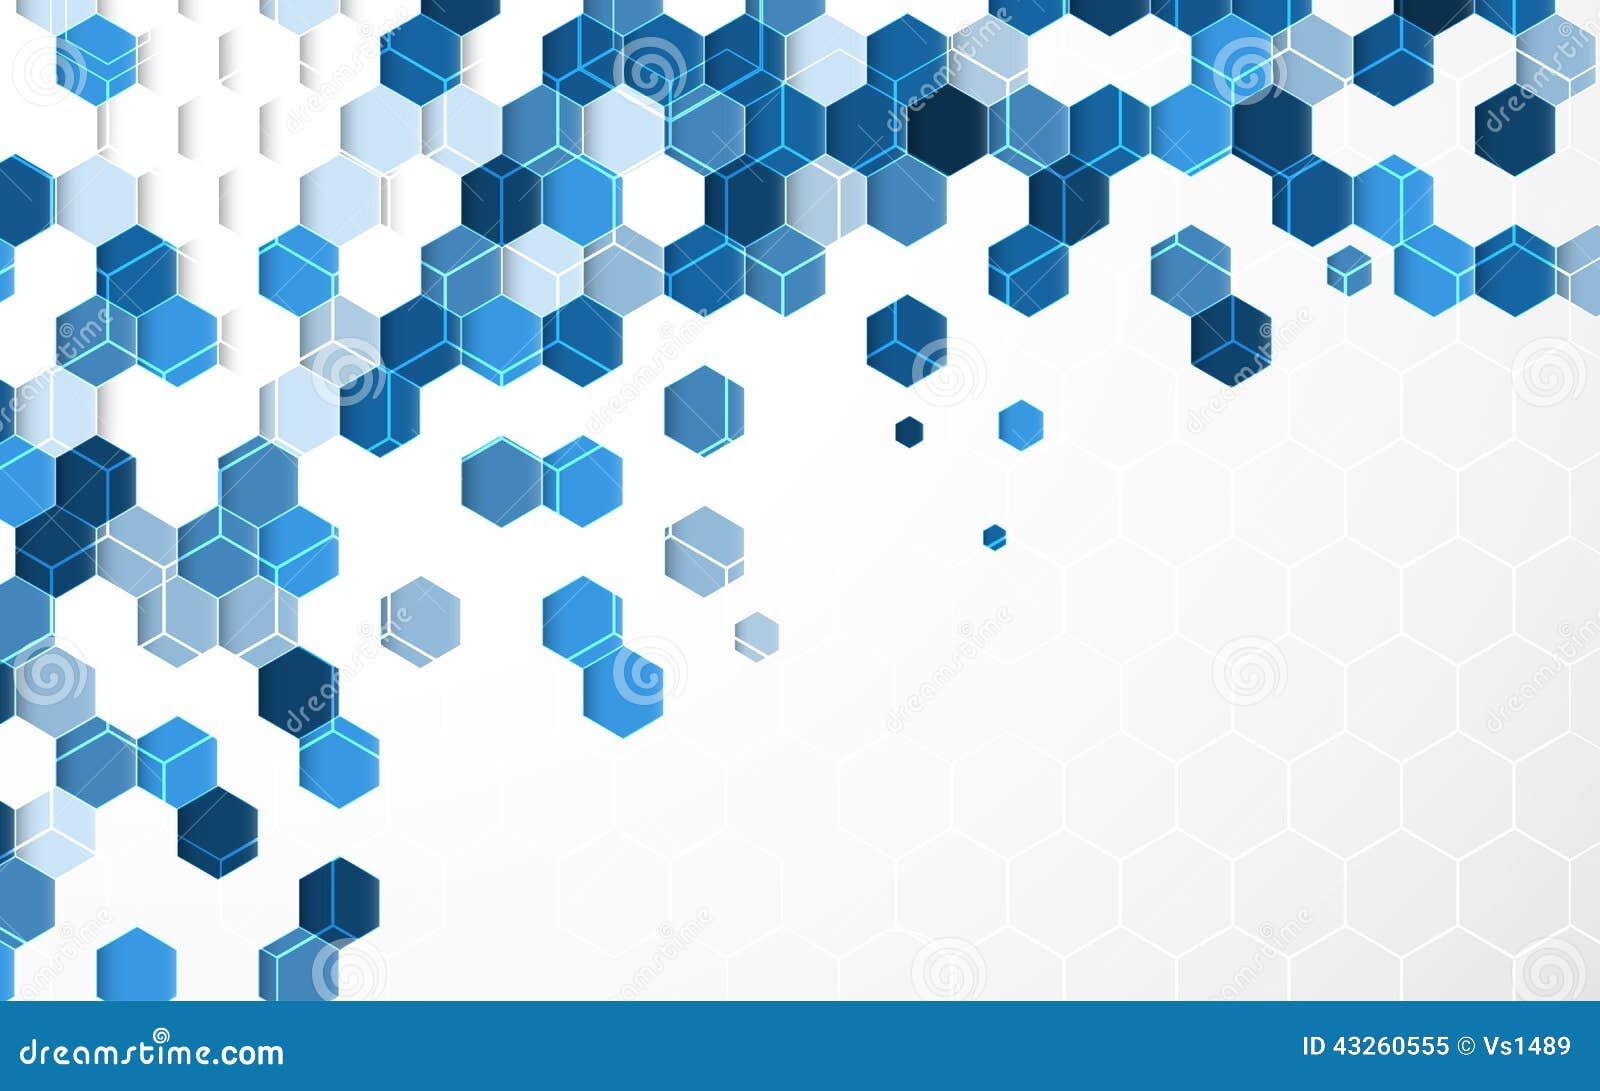 wallpaper blue hexagon white - photo #13